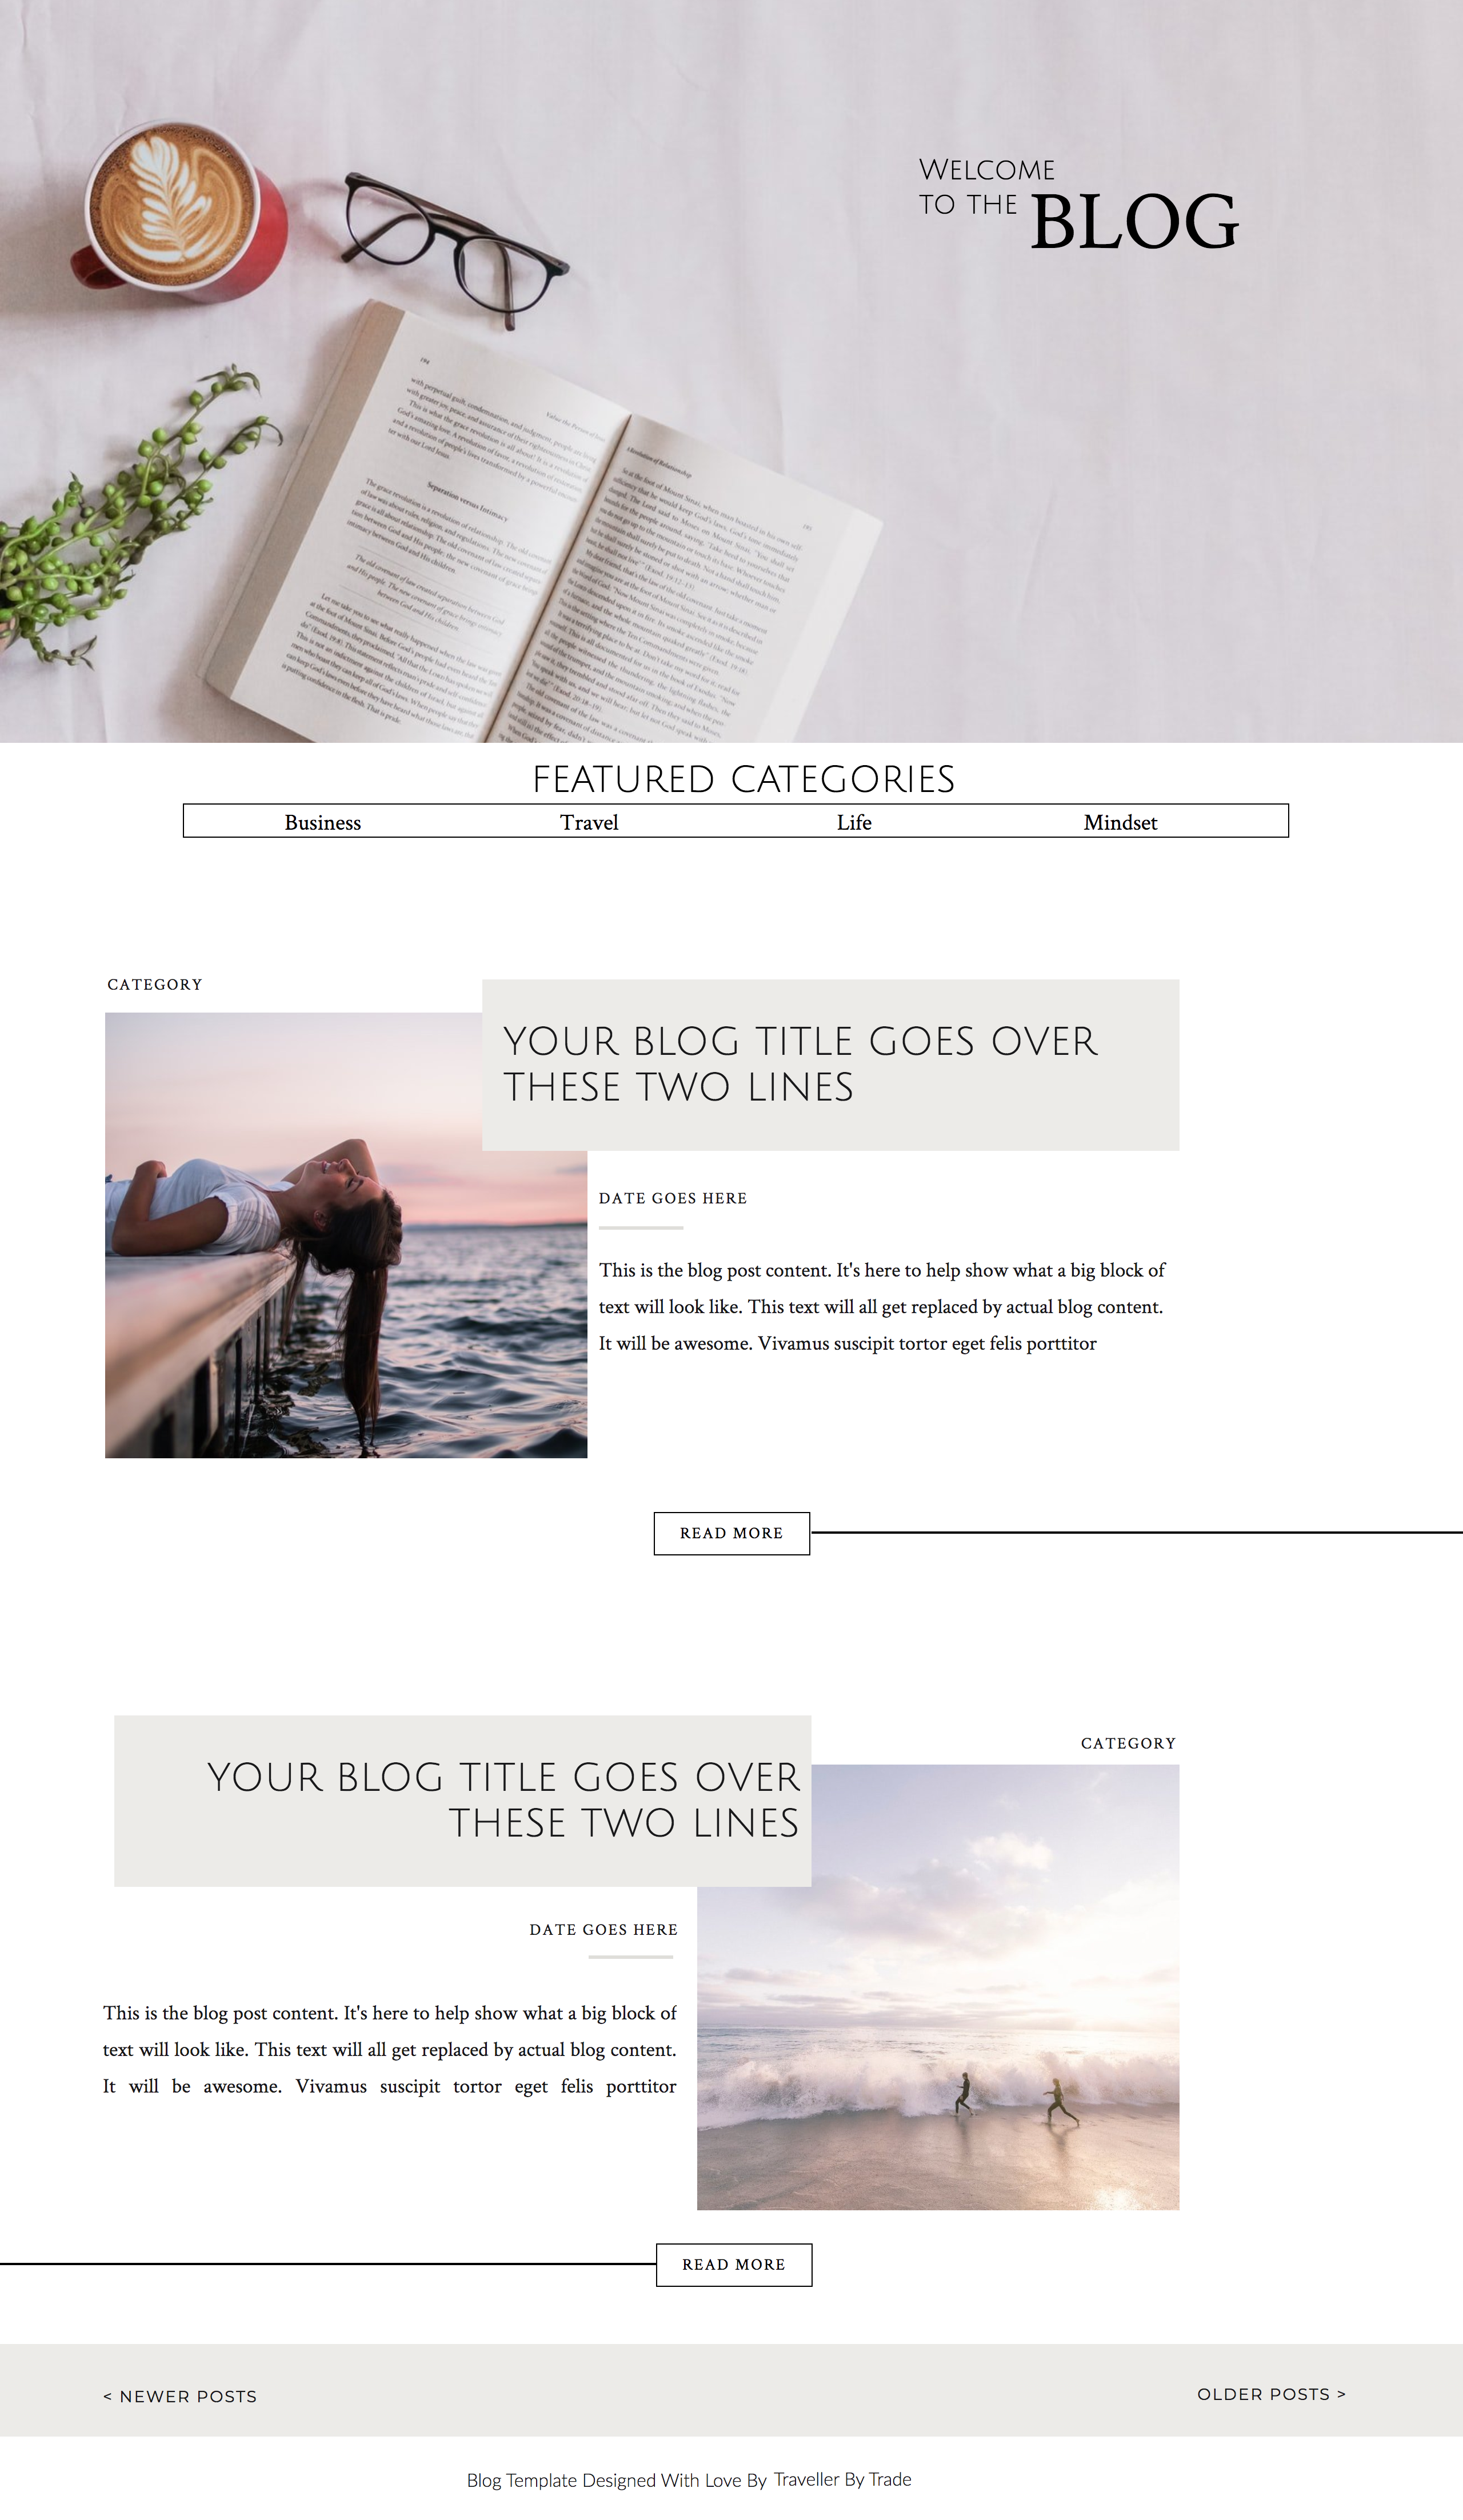 Blog Template For Showit Websites By Traveller By Trade In 2020 Web Design Programs Blog Template Design Website Inspiration